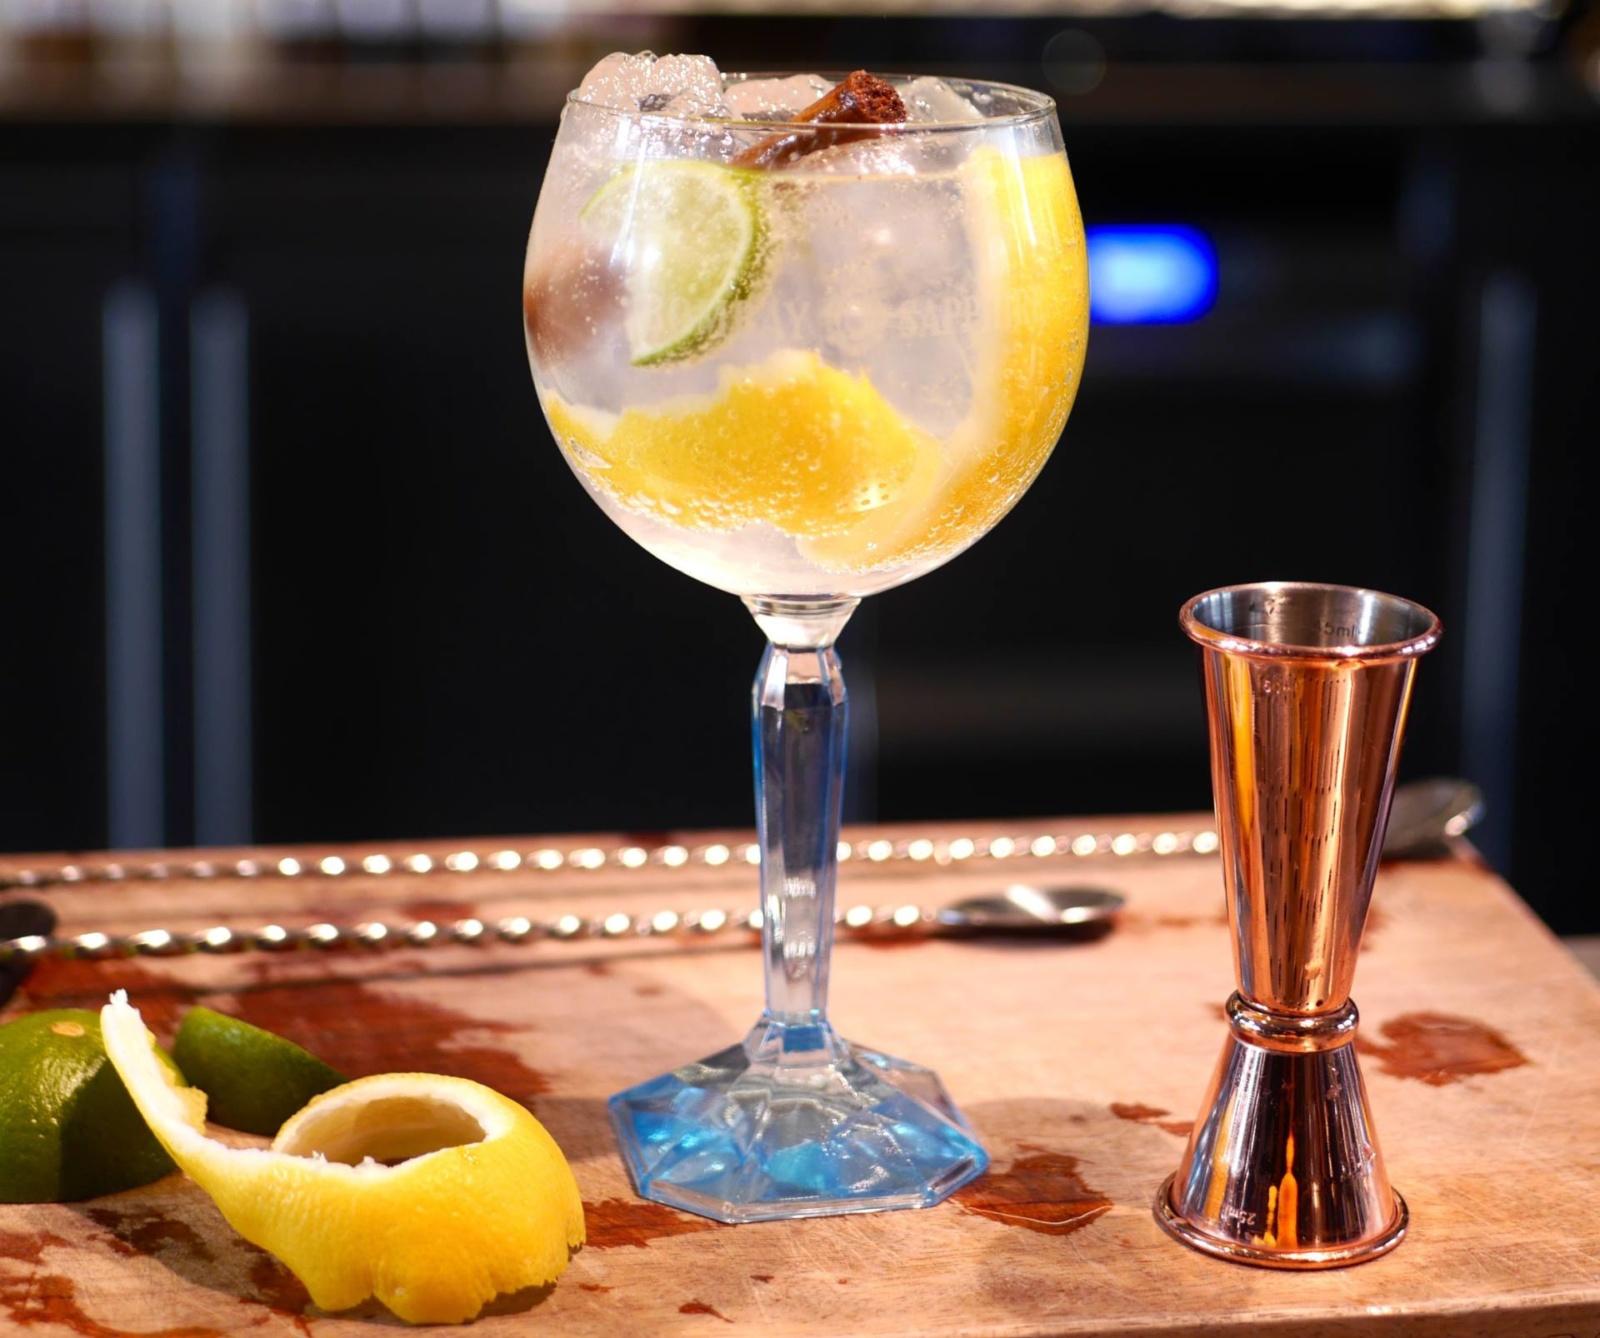 bombay-sapphire-distillery-laverstoke-mill-gin-tonic